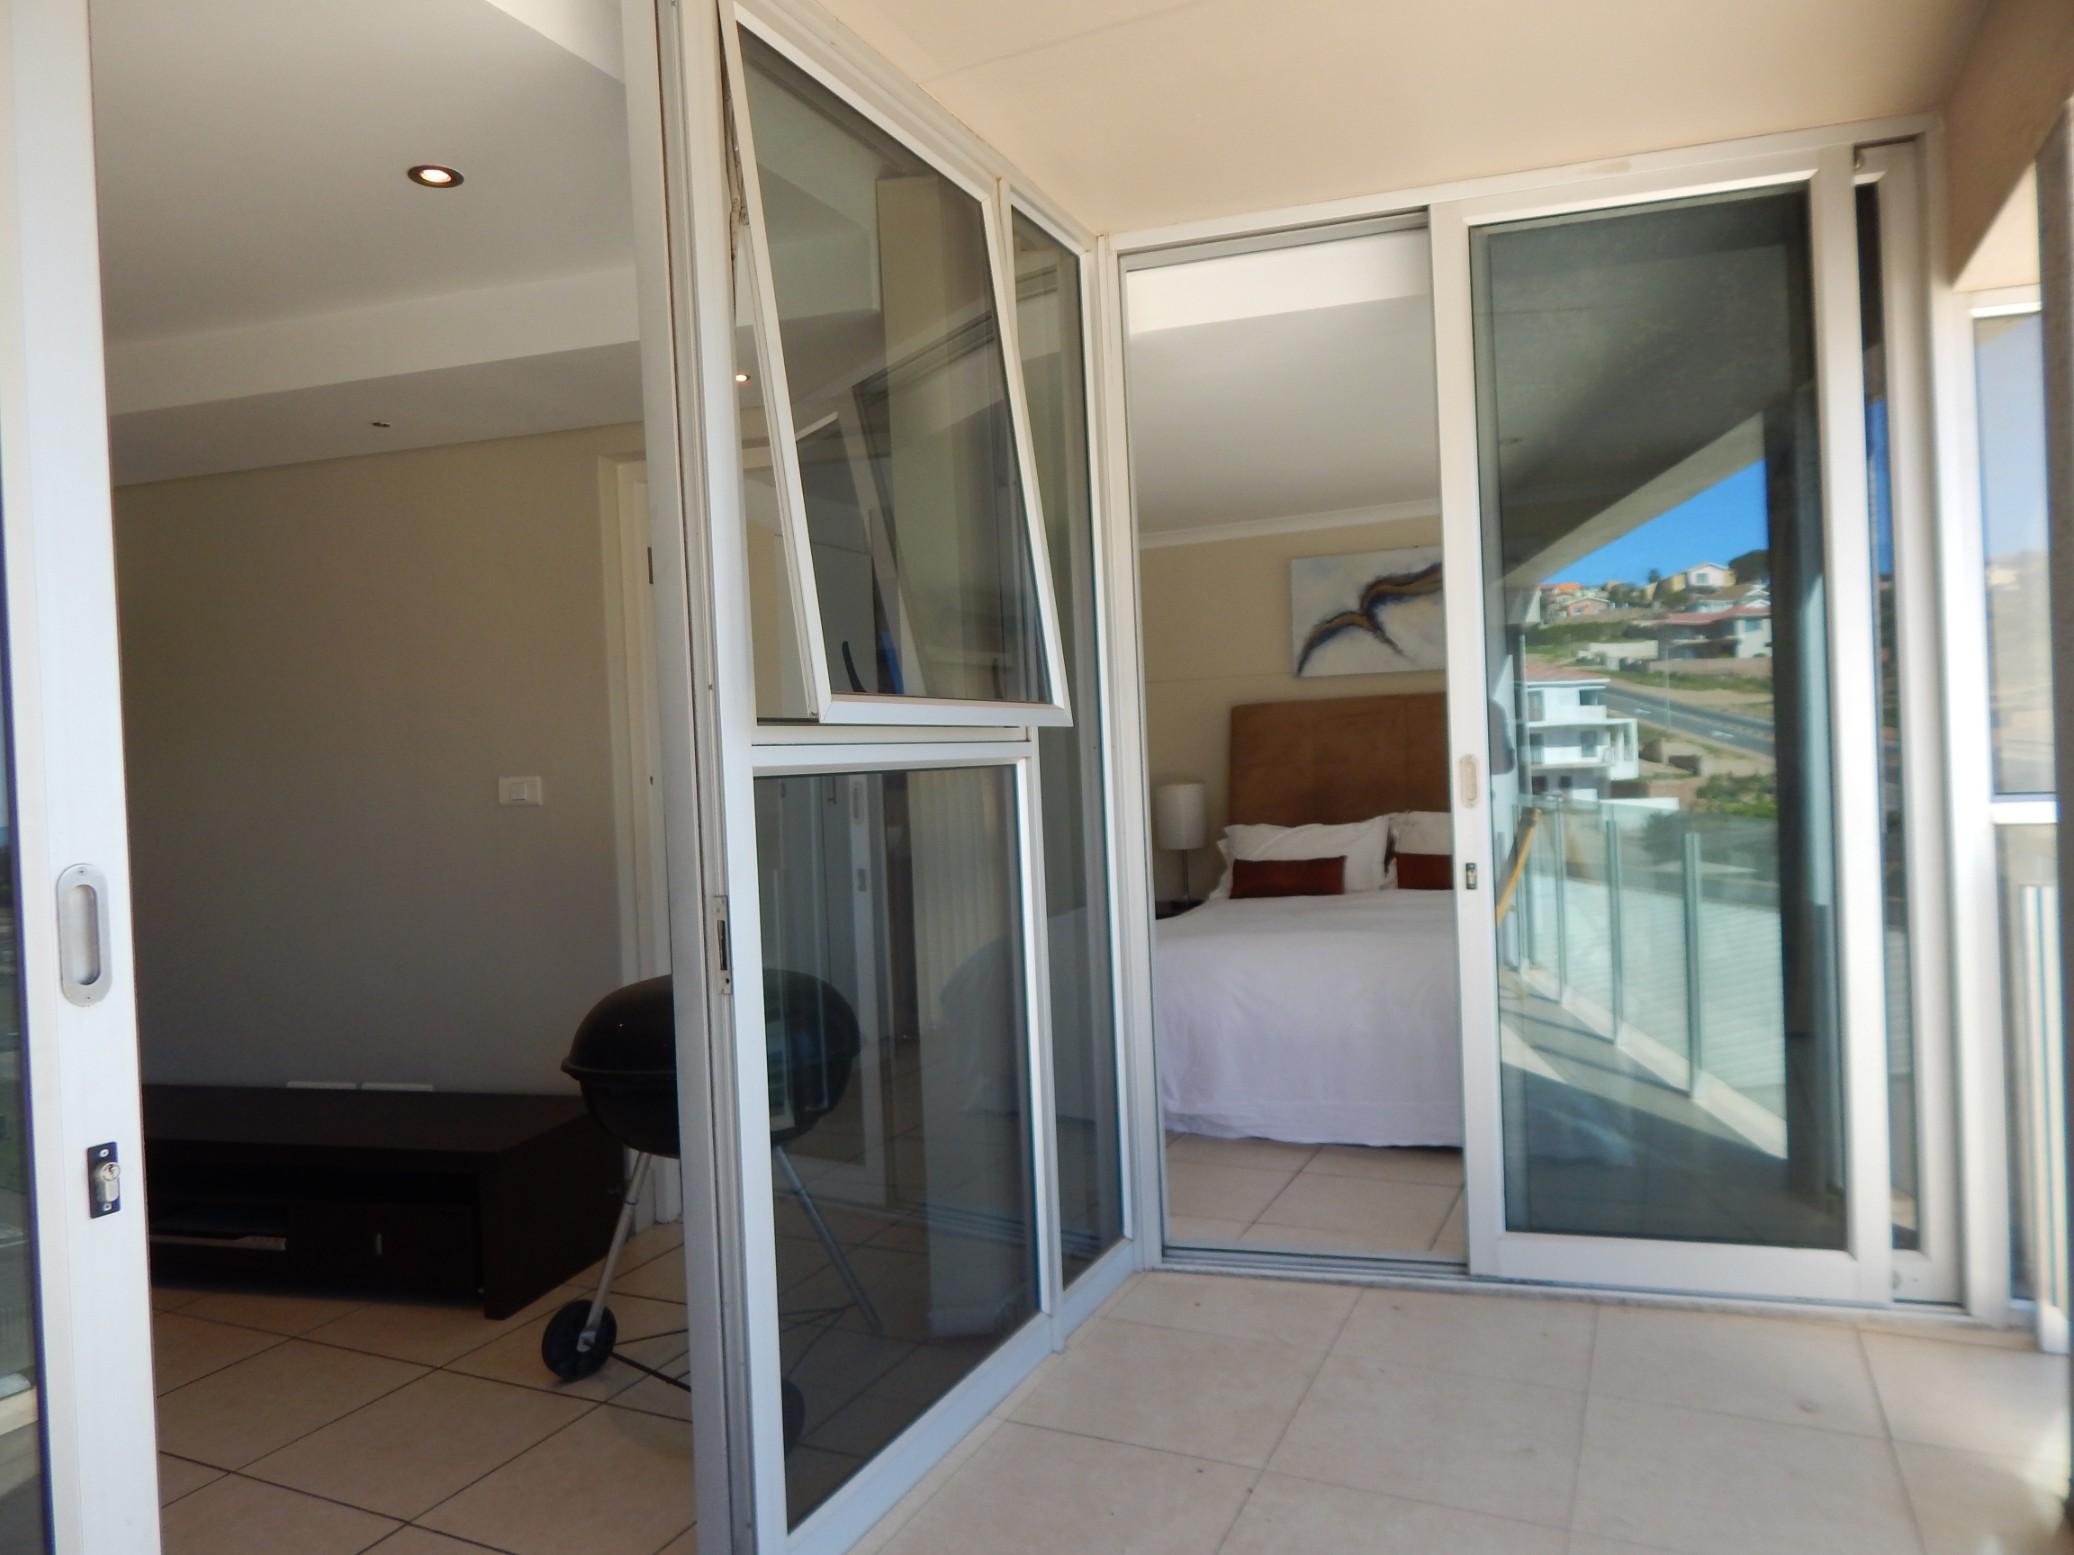 2 Bedroom Apartment for sale in De Bakke ENT0067862 : photo#3